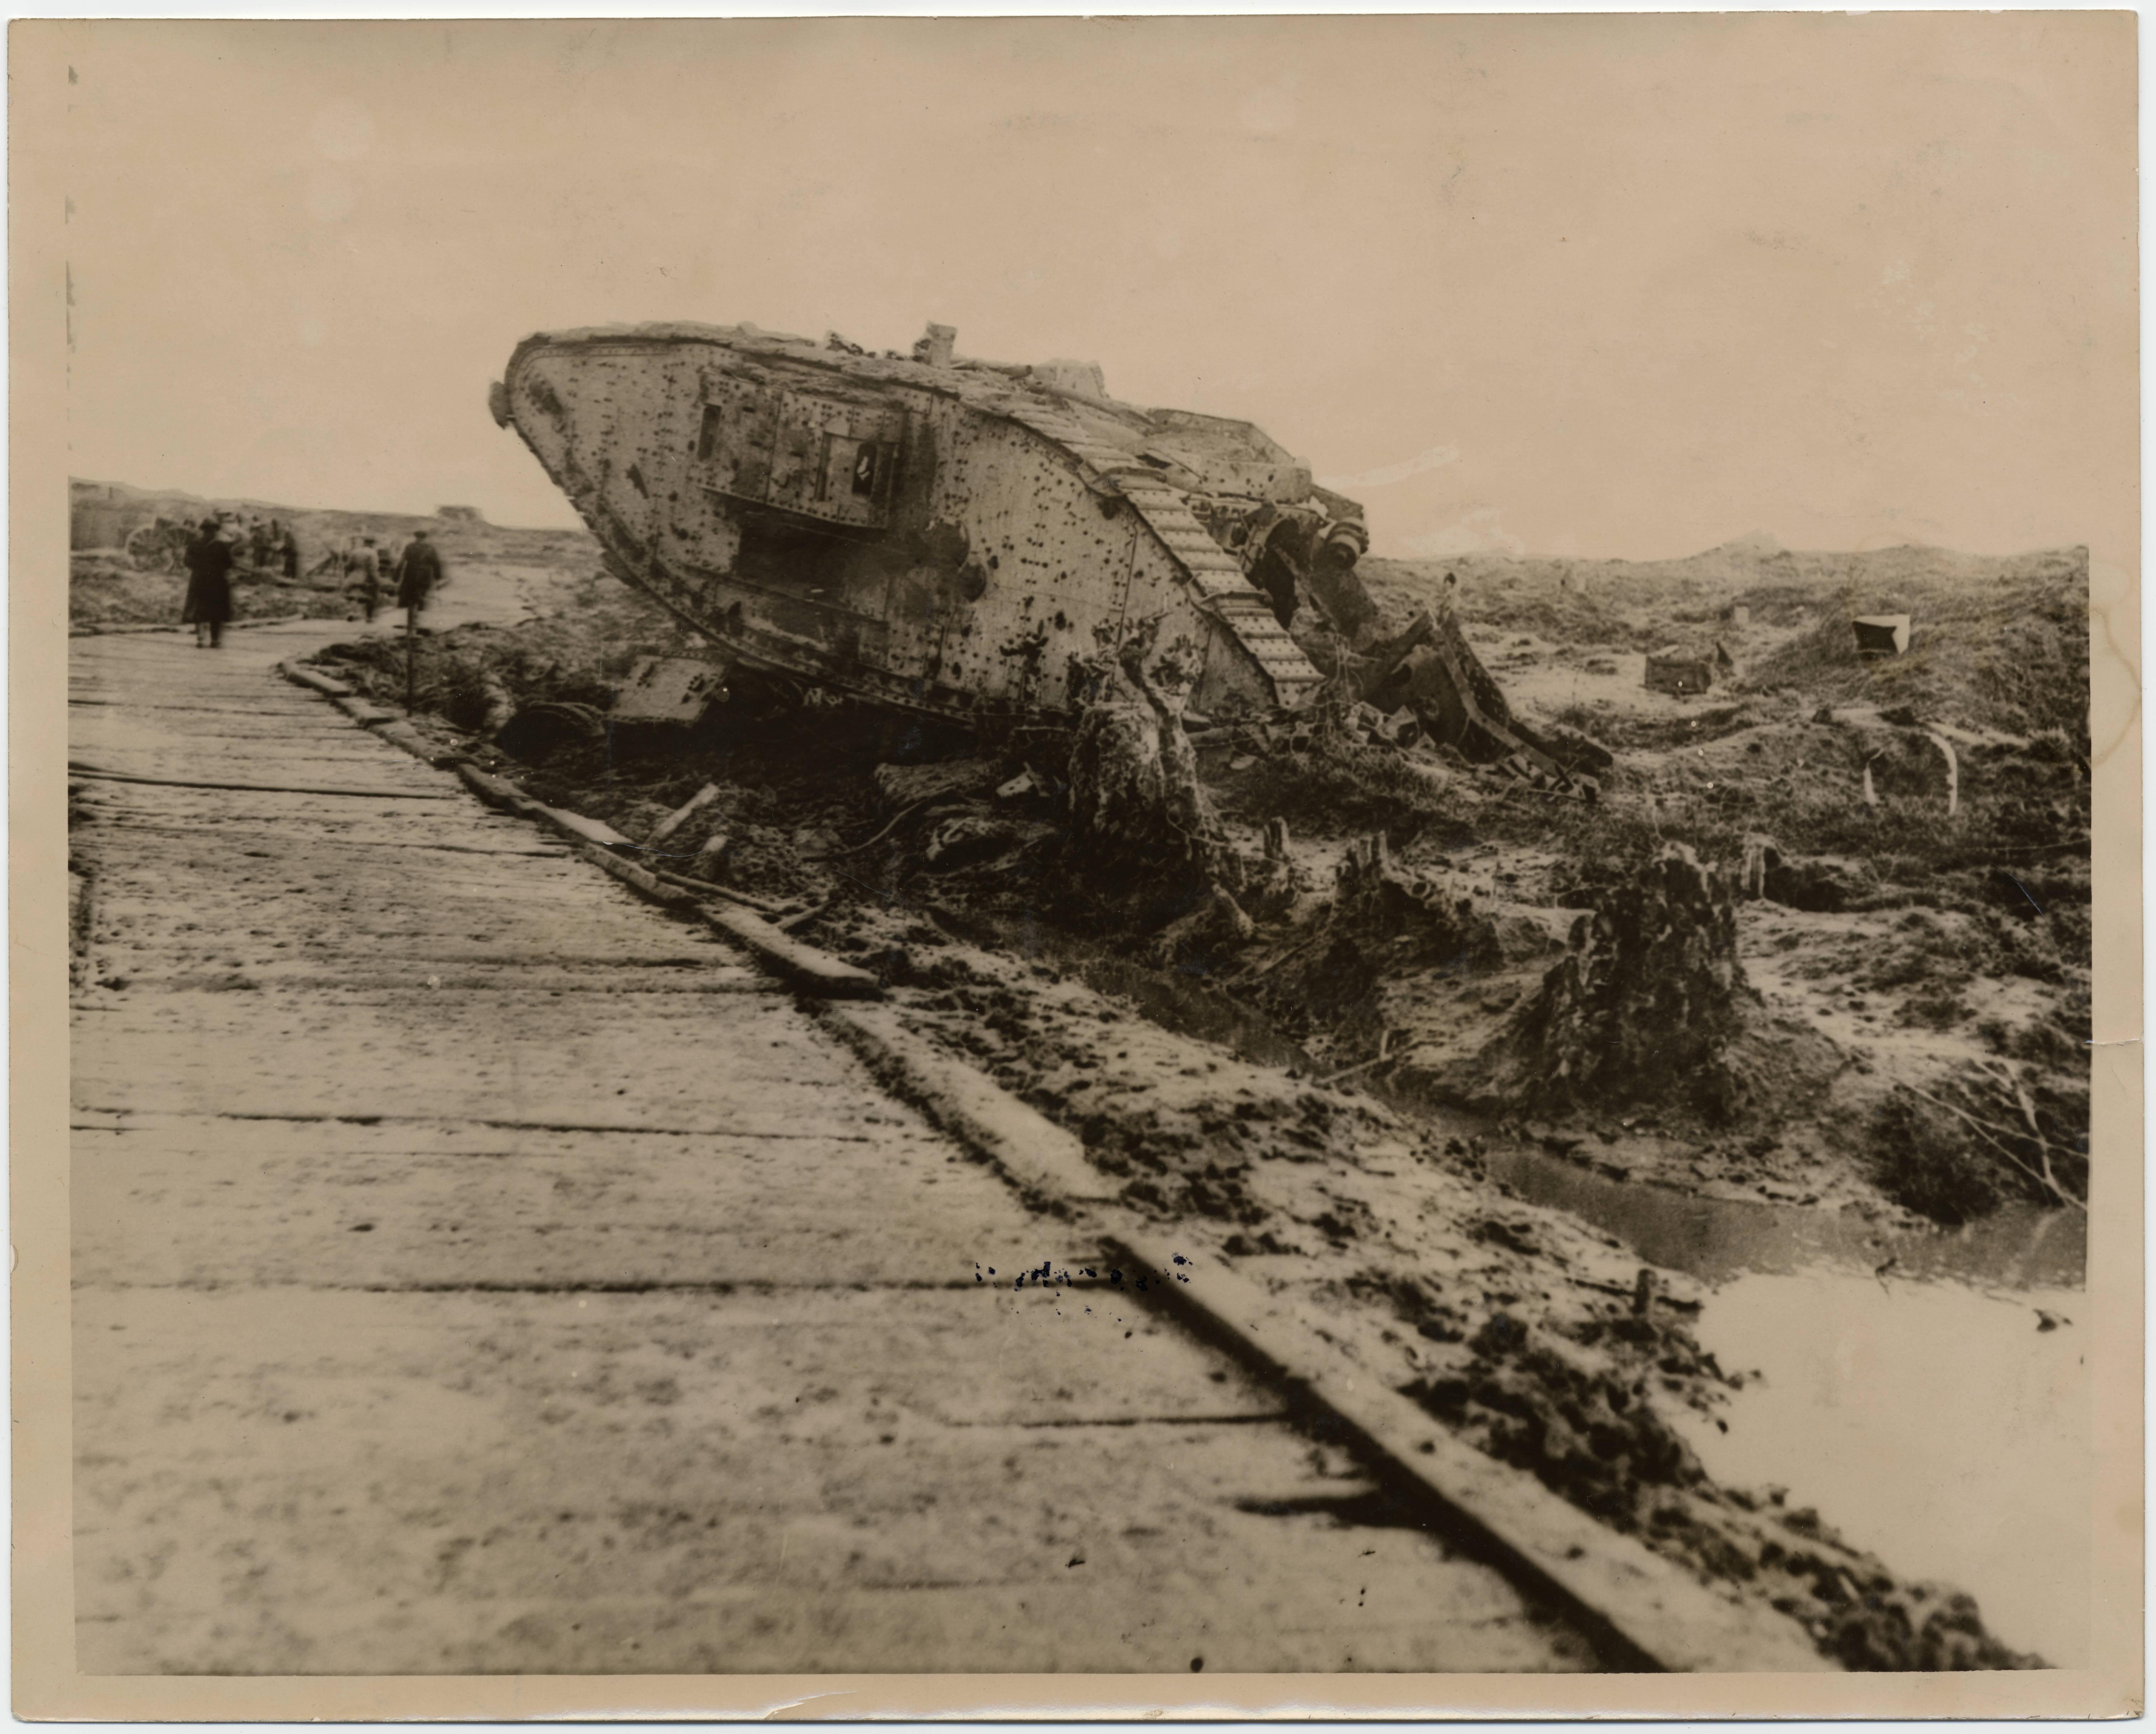 File Passchendaele Destroyed Tank In Graveyard